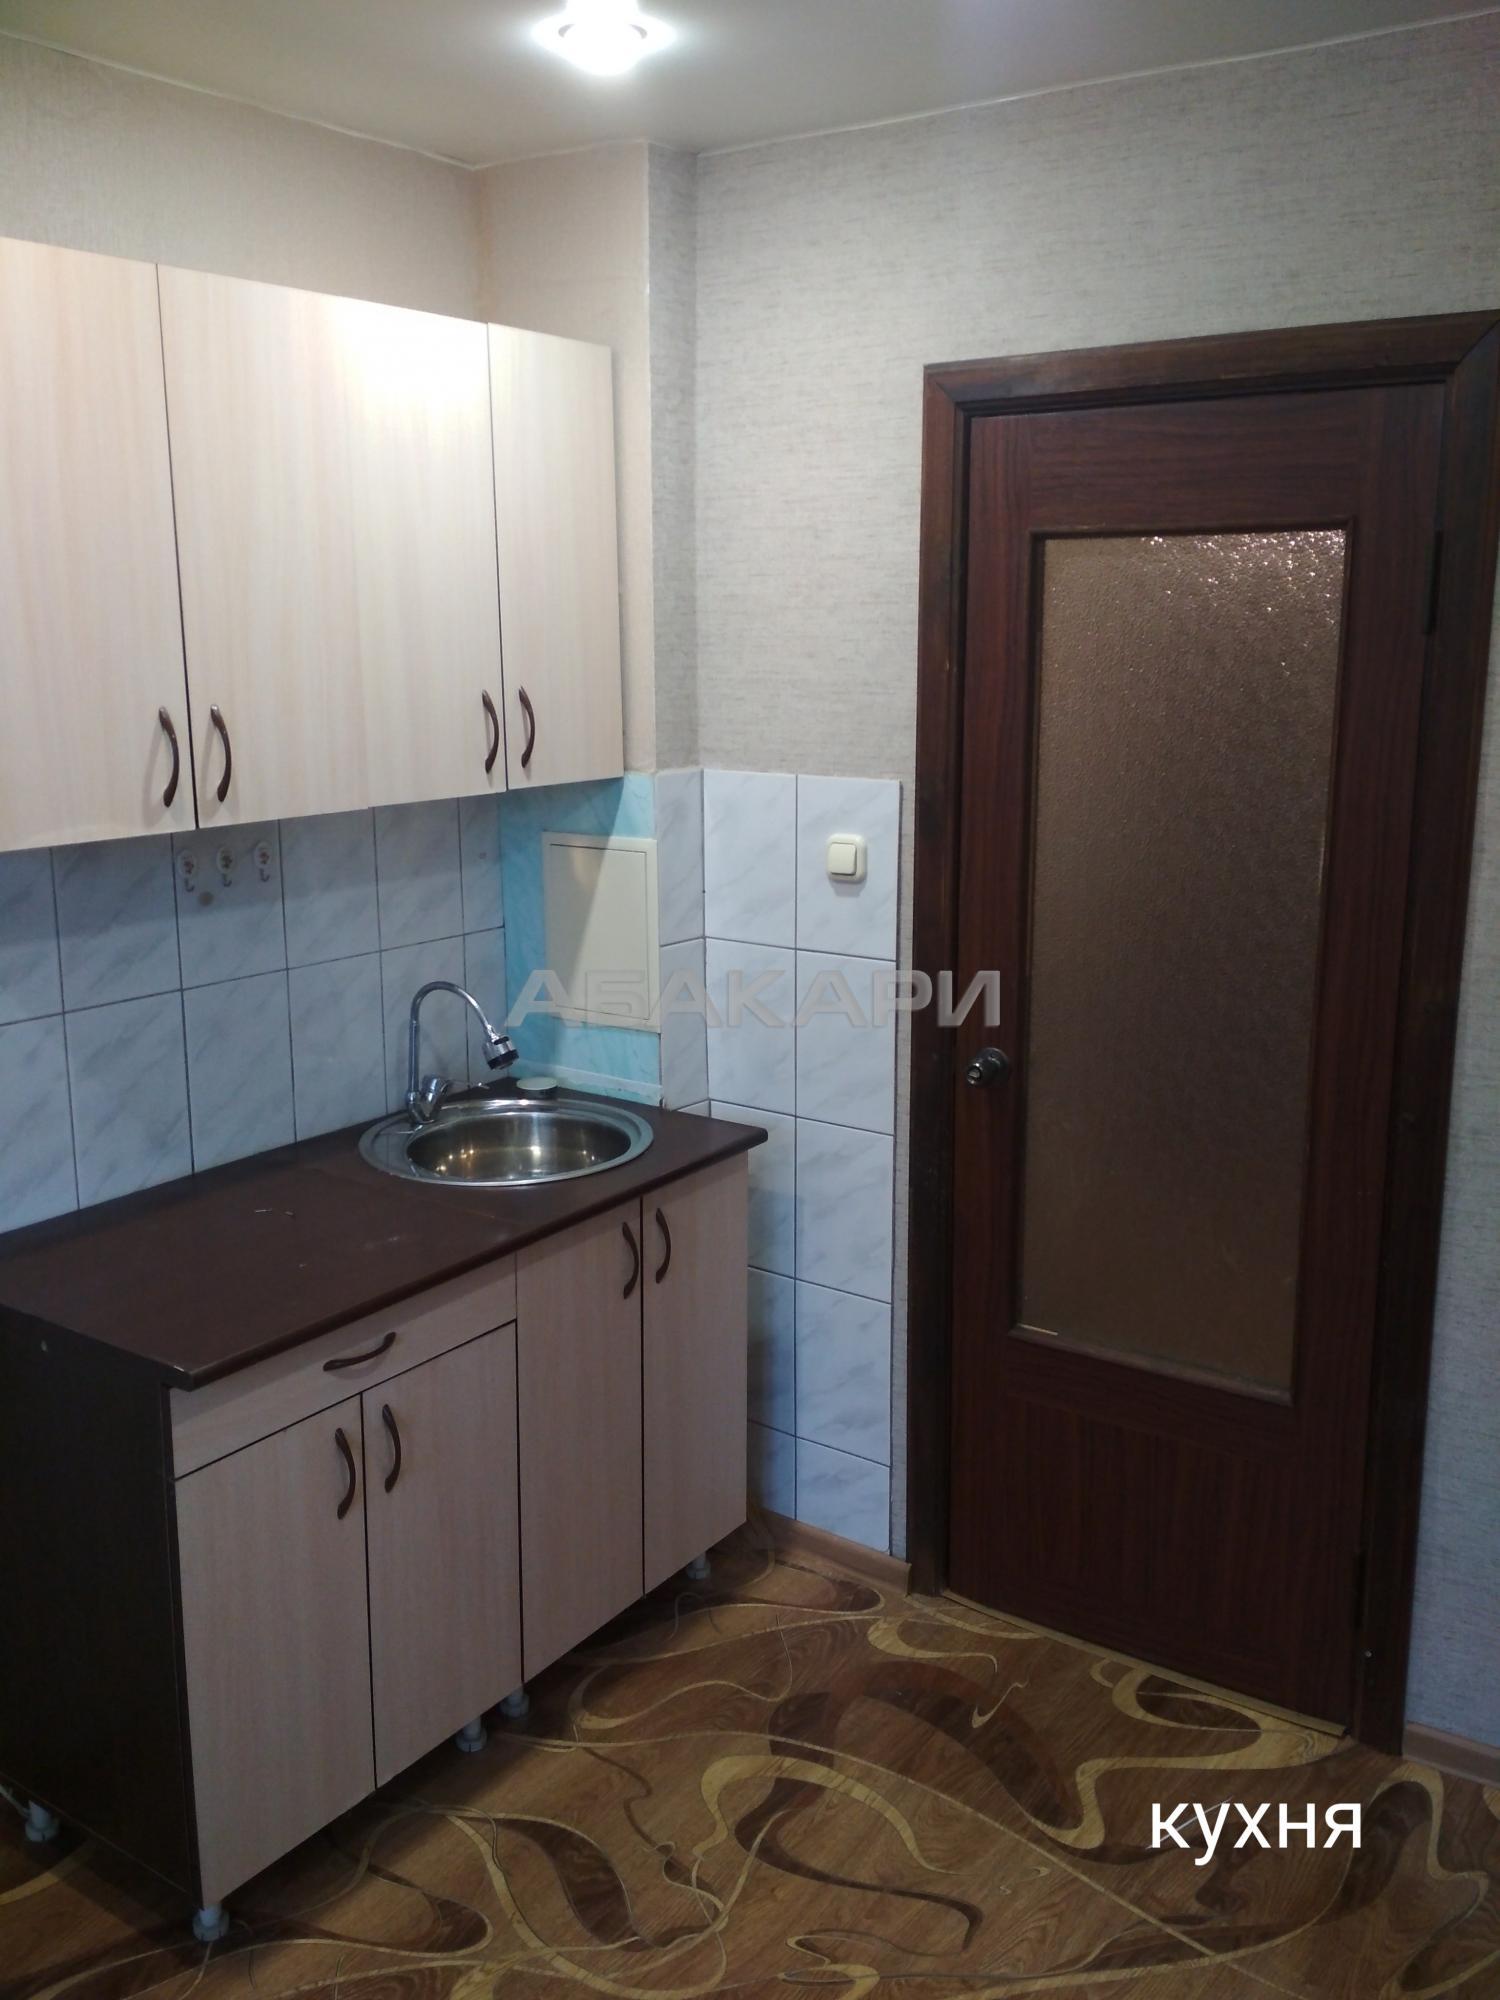 1к квартира Московская улица, 13 | 12000 | аренда в Красноярске фото 2